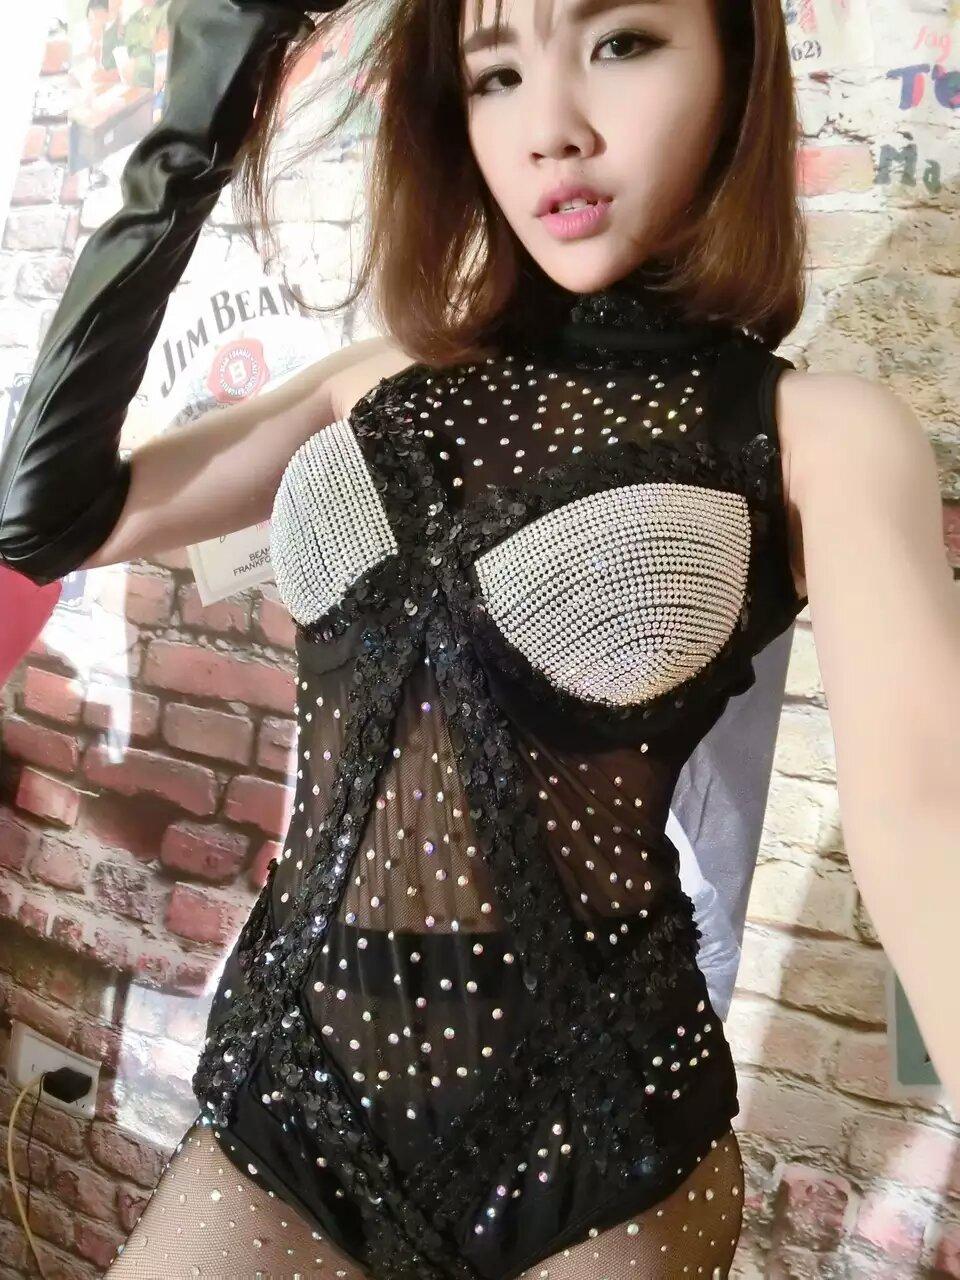 Women's Black Perspective Rhinestone Bodysuit Party Dress Costume Female Singer DJ Dance Stage Wear Prom Show One-piece Dresses(China (Mainland))